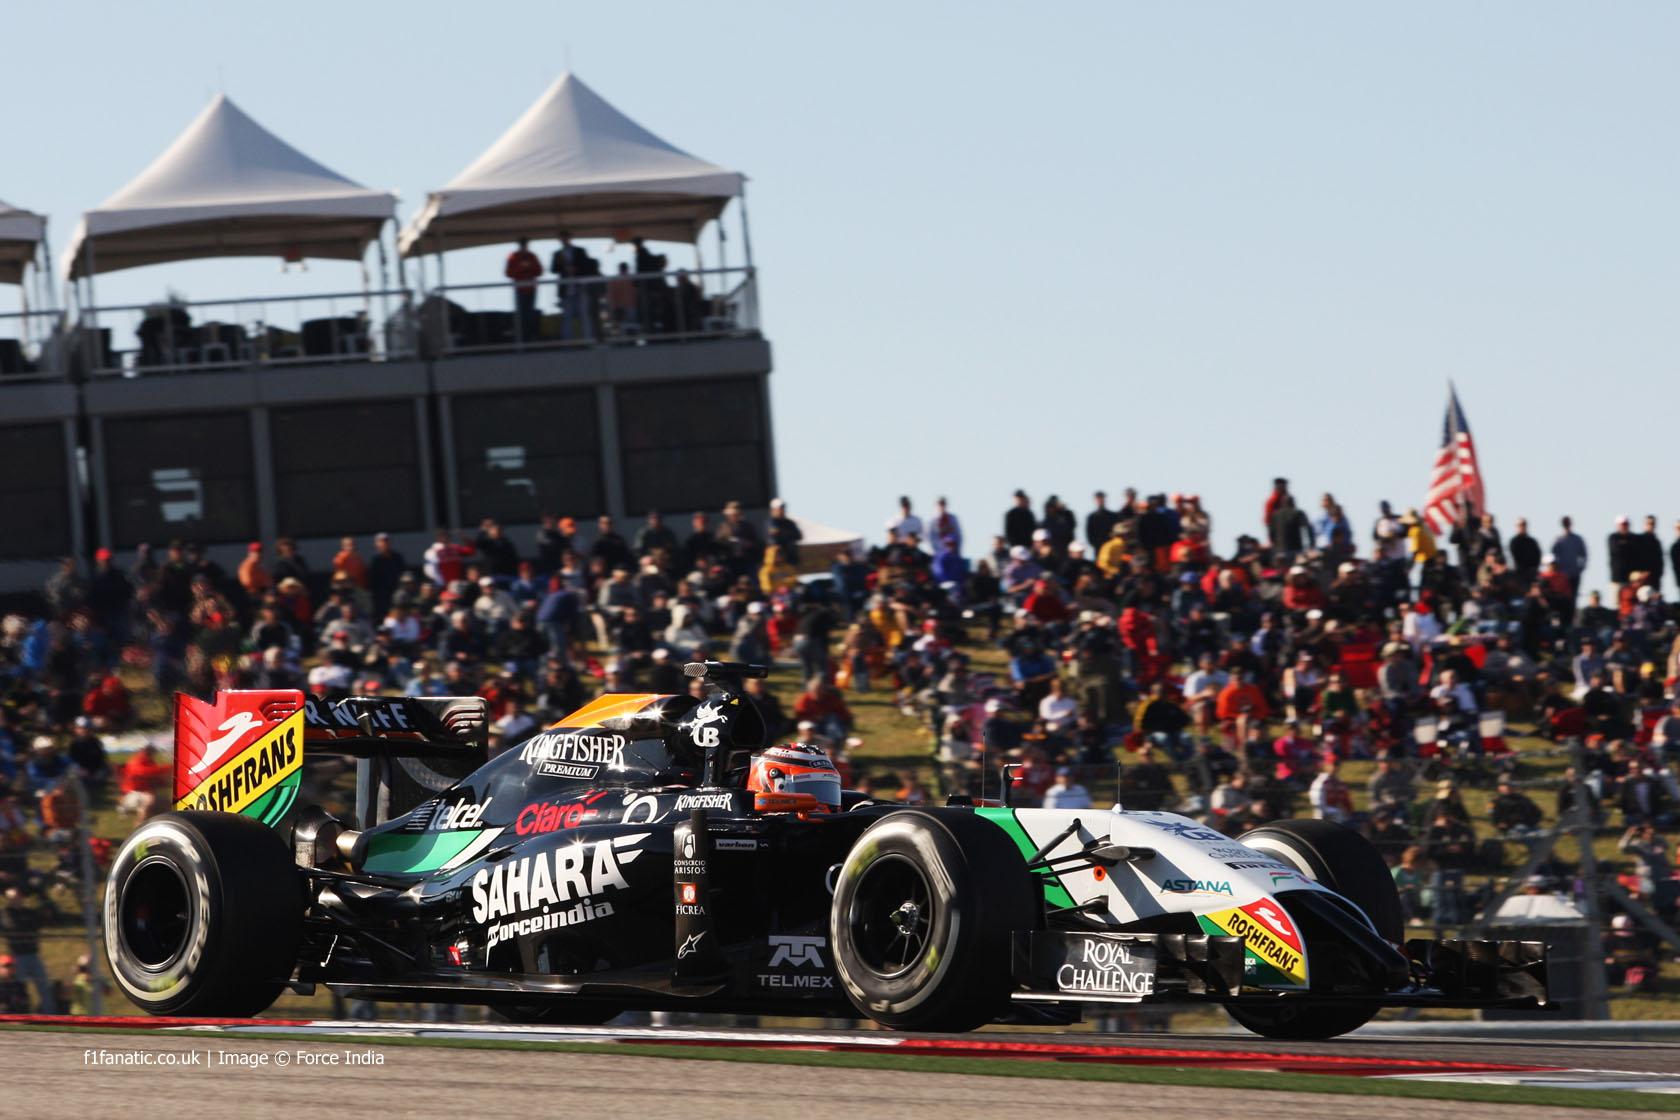 Nico Hulkenberg, Force India, Circuit of the Americas, 2014